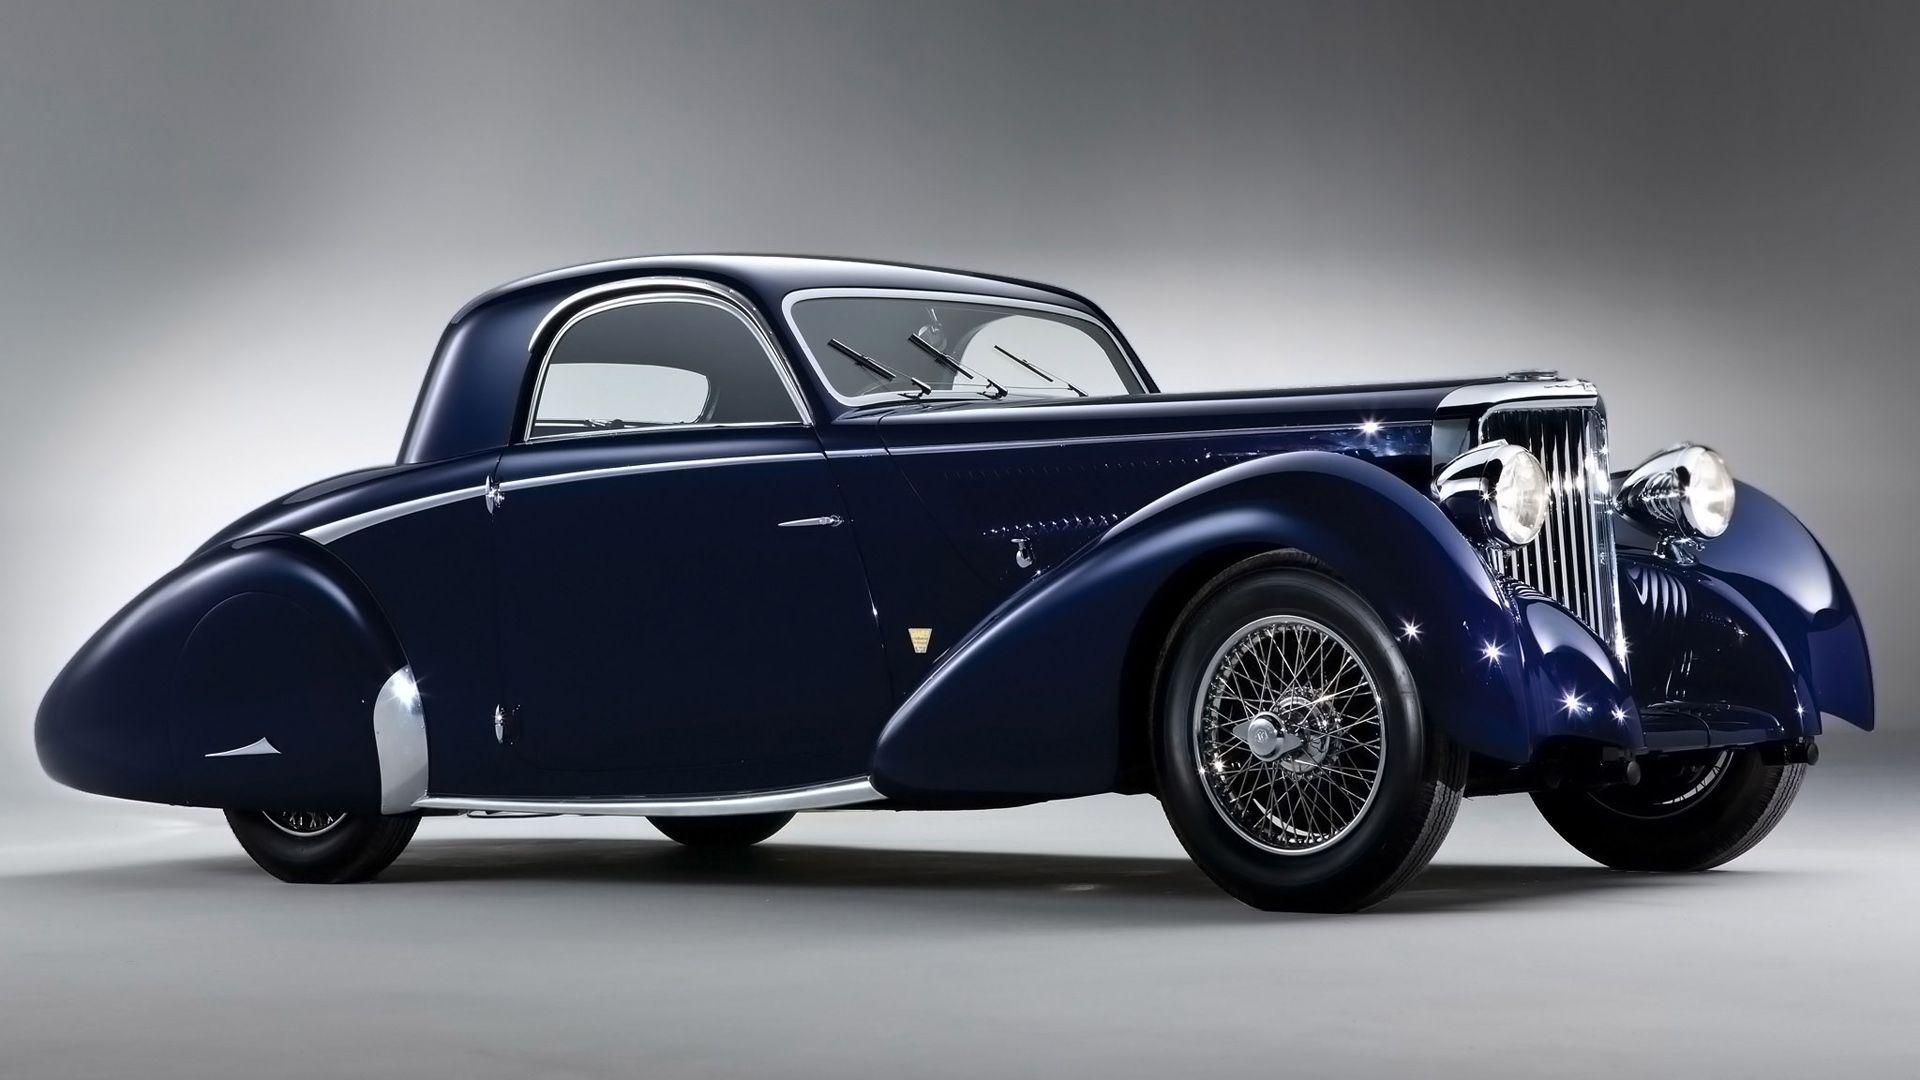 Classic Car Desktop Wallpapers Top Free Classic Car Desktop